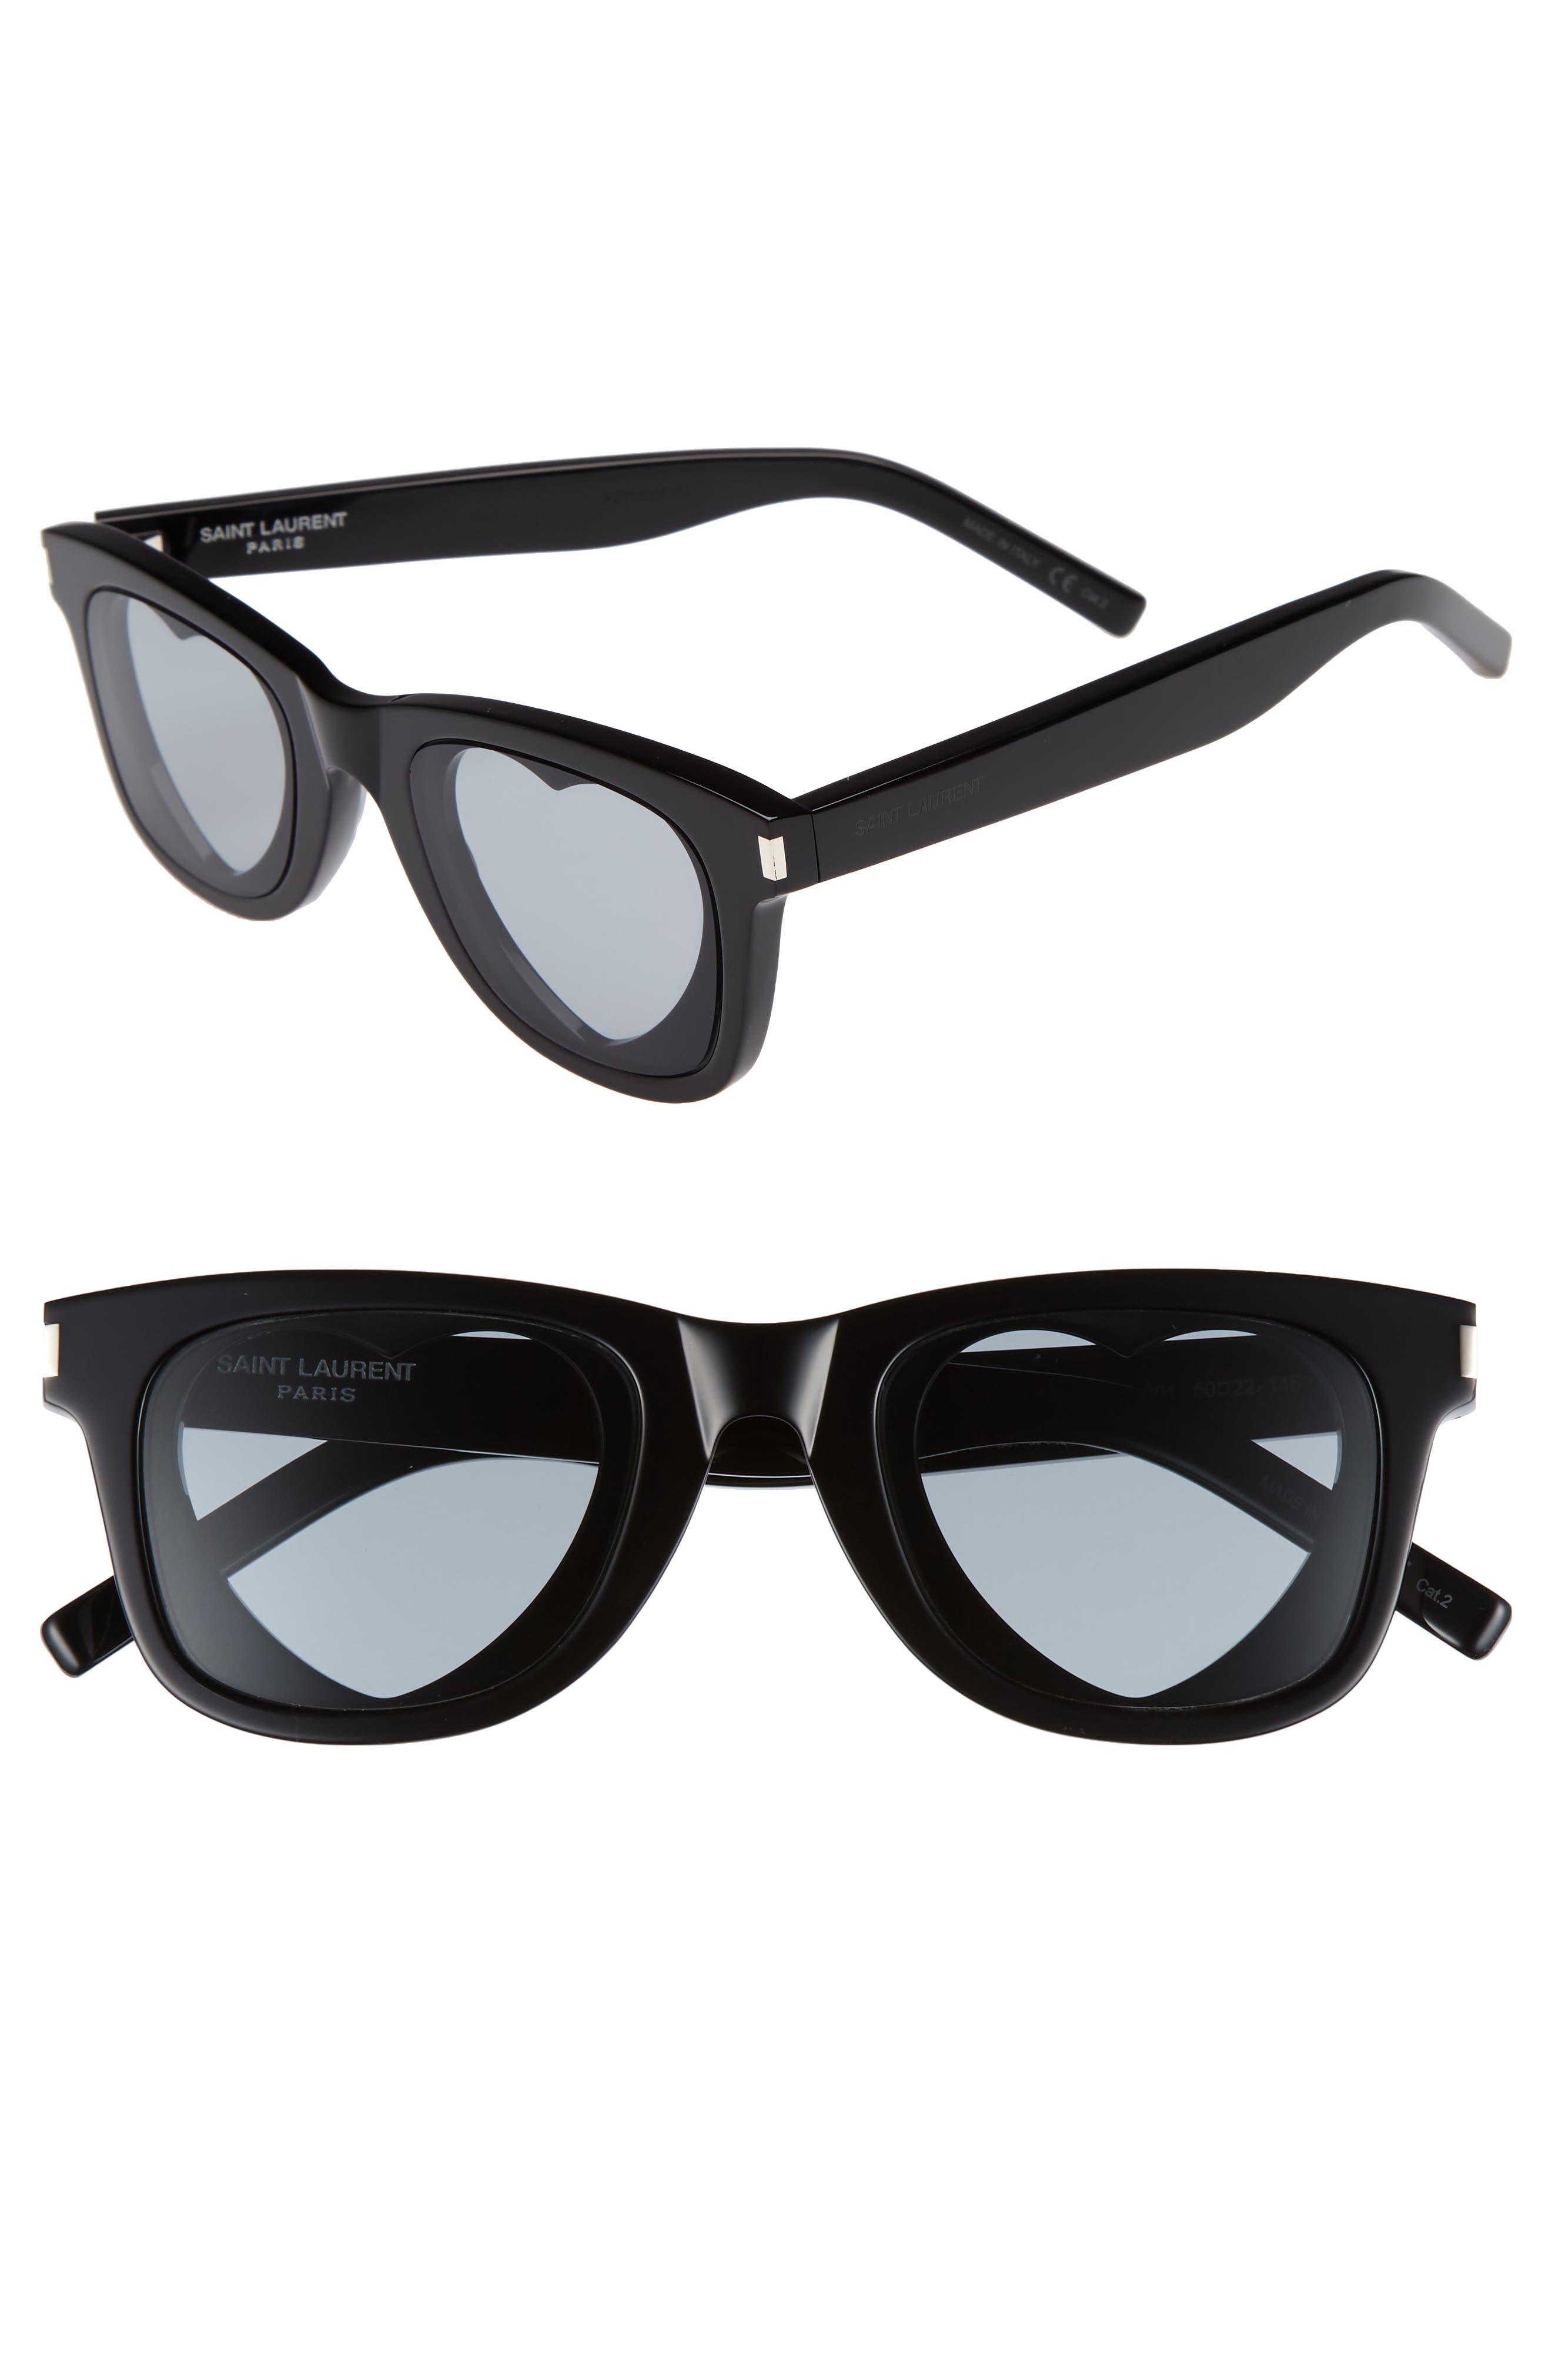 50mm Heart Sunglasses,                             Main thumbnail 1, color,                             Black